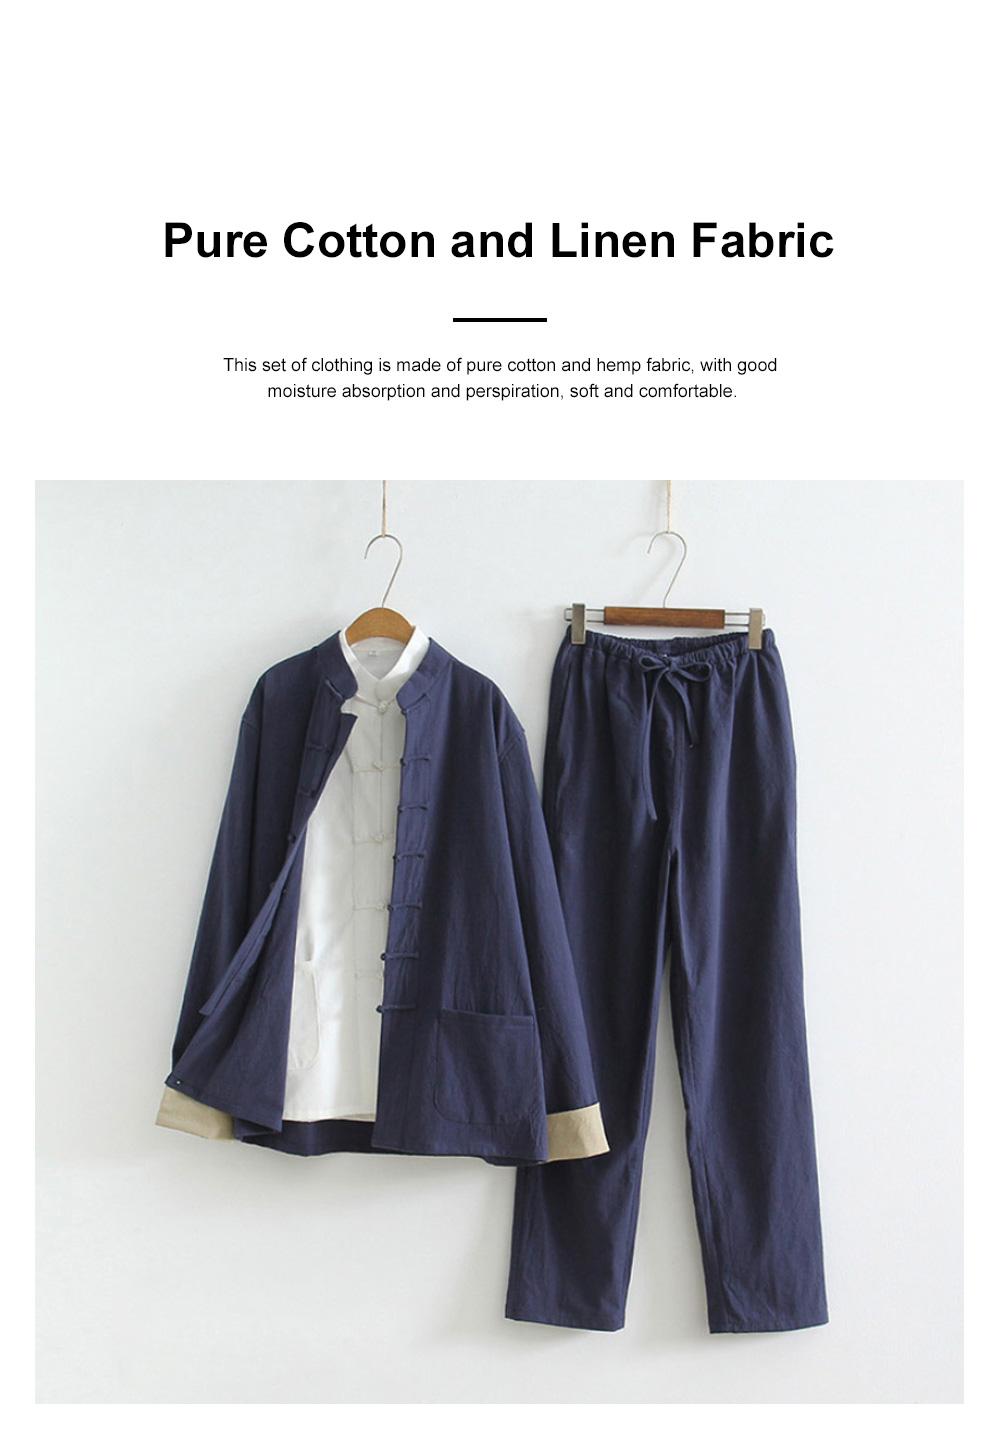 Li Ziqi's Chinese Style Clothes Retro Han Suit Chinese Ancient Style Cotton Hemp Three Piece Suit Reclusive Clothes Meditation Clothes 1